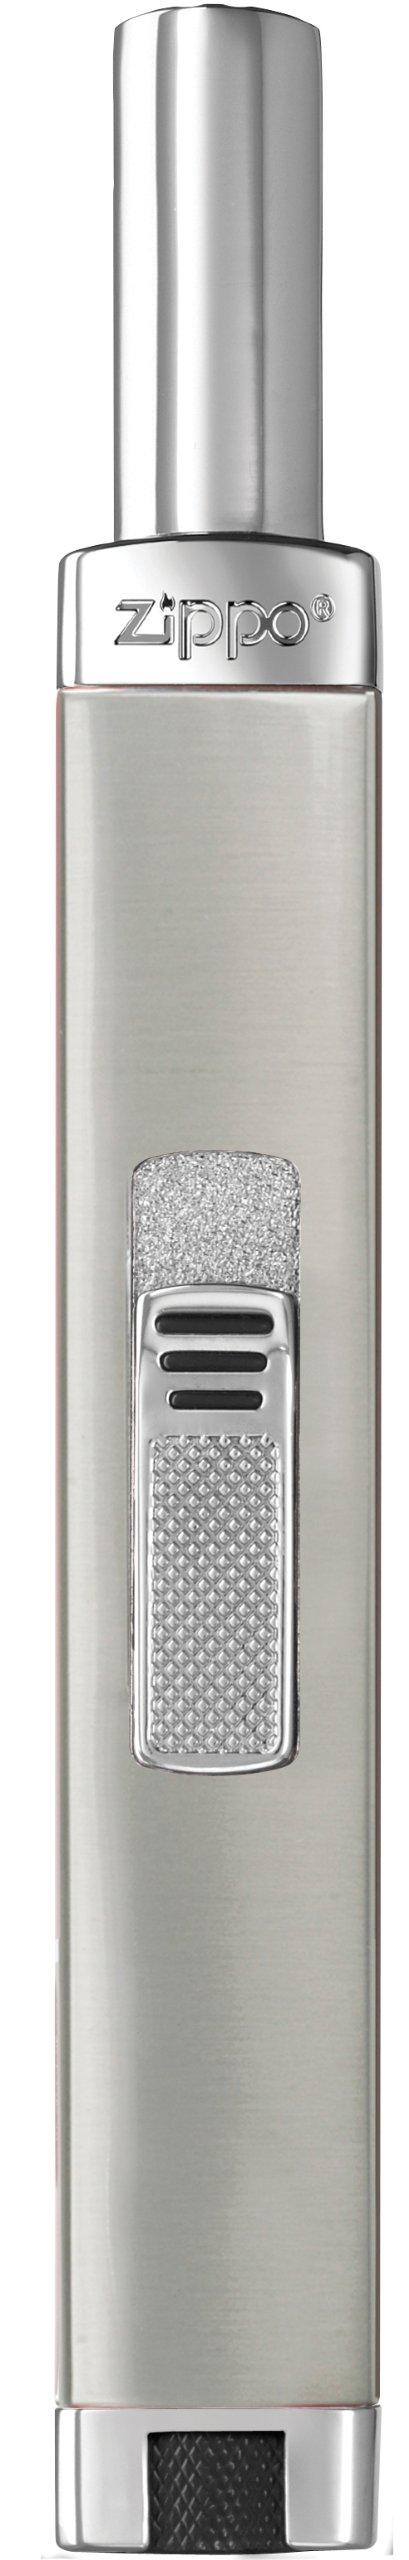 Zippo Multi Purpose Candle Lighter